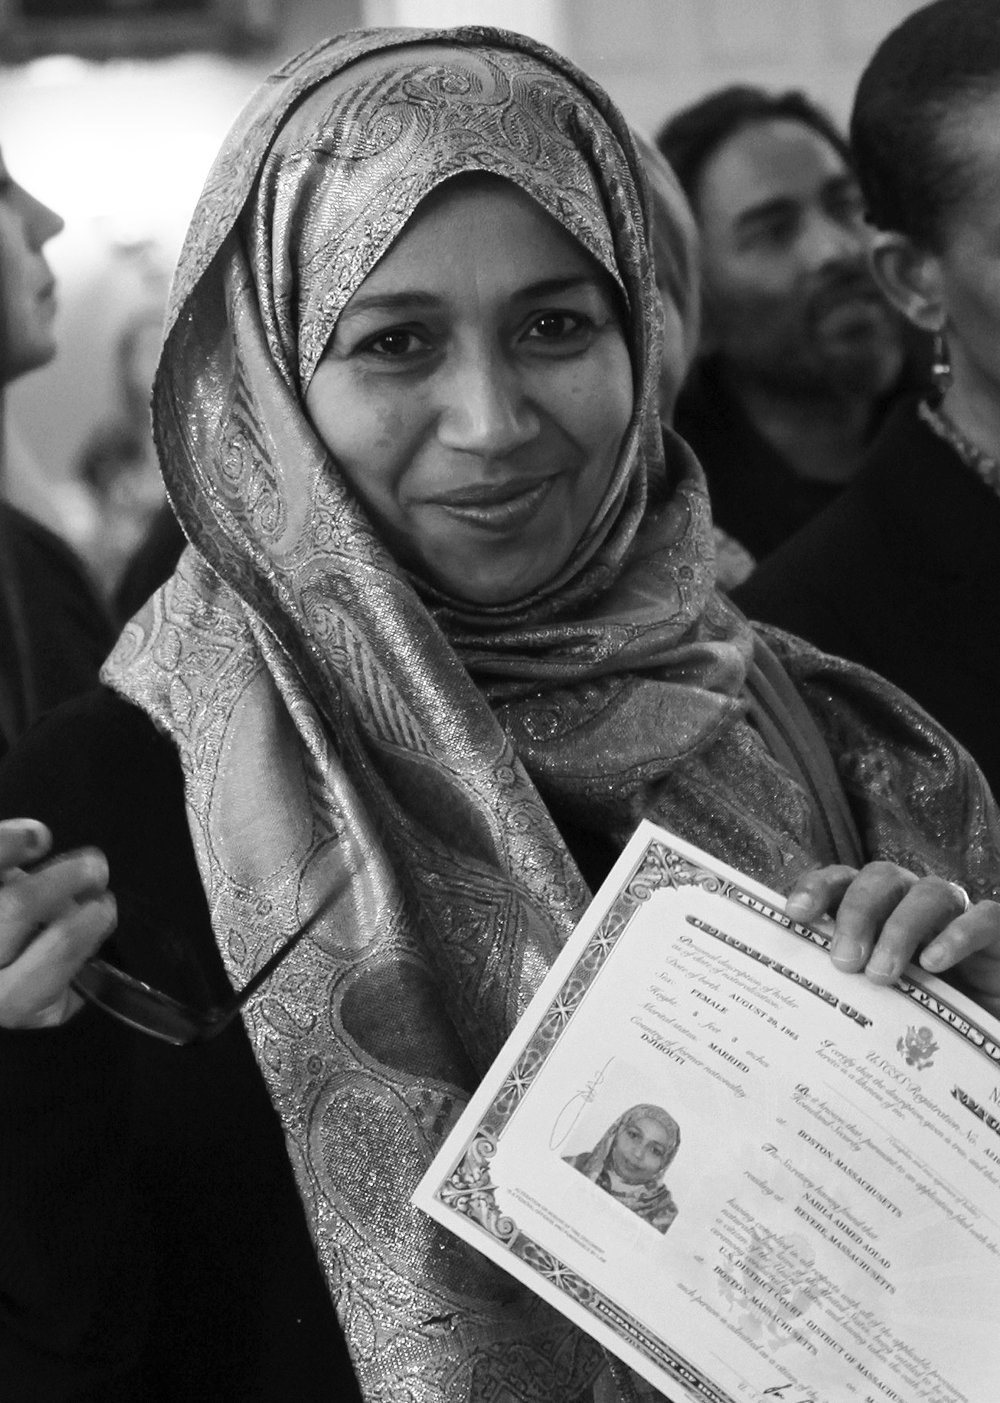 Djibouti Aouad certificate_8868 copy 2.jpg